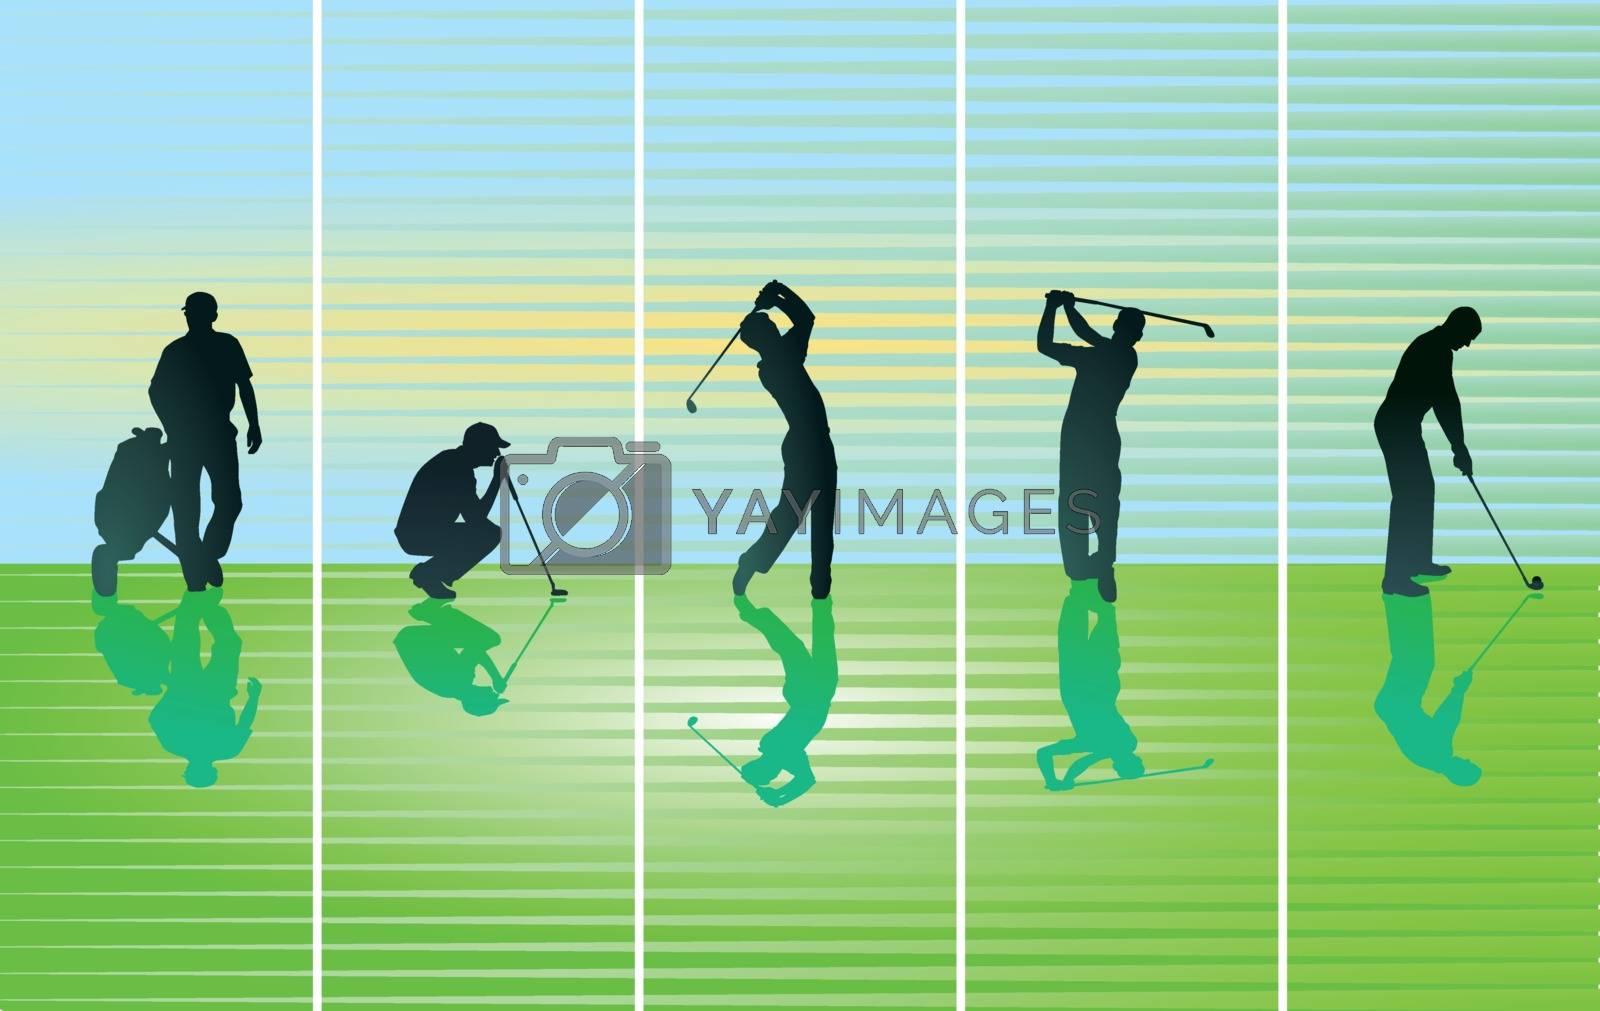 Golfer on green, illustration